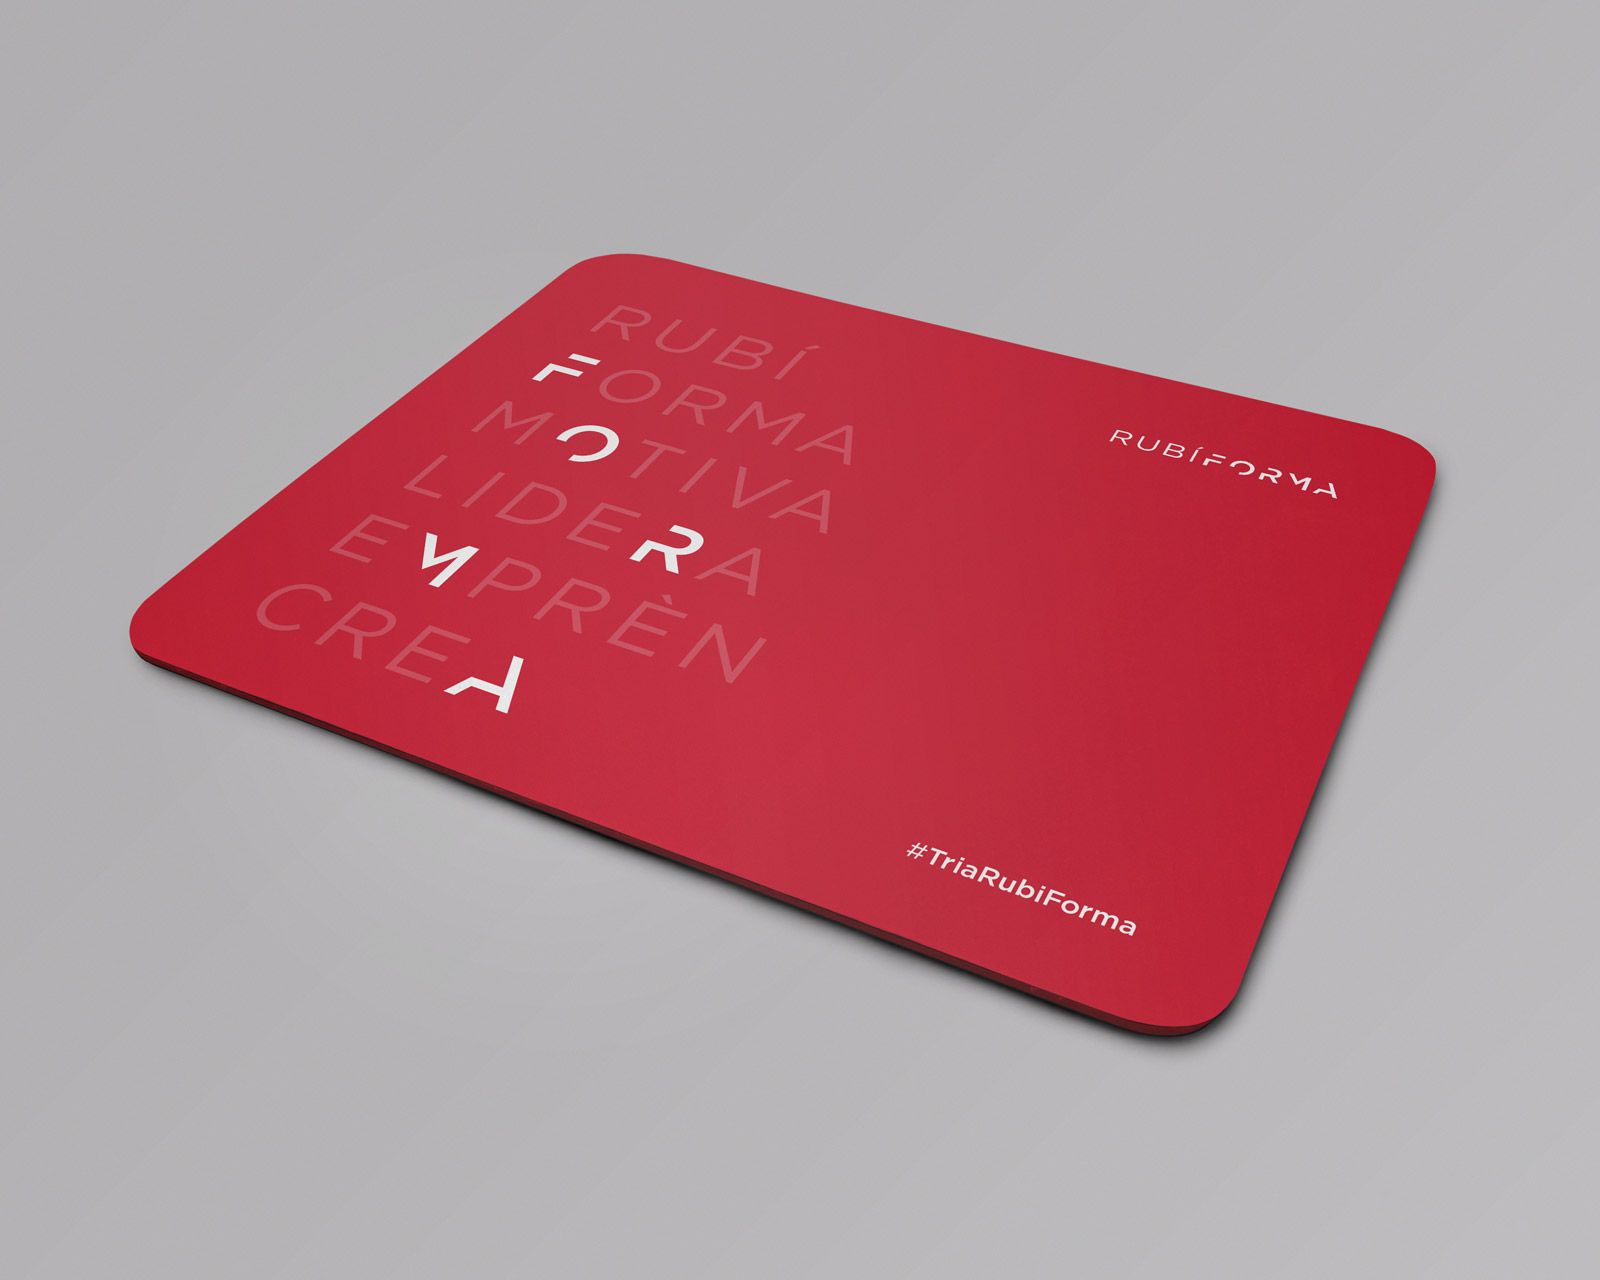 metode-design-rubiforma-10